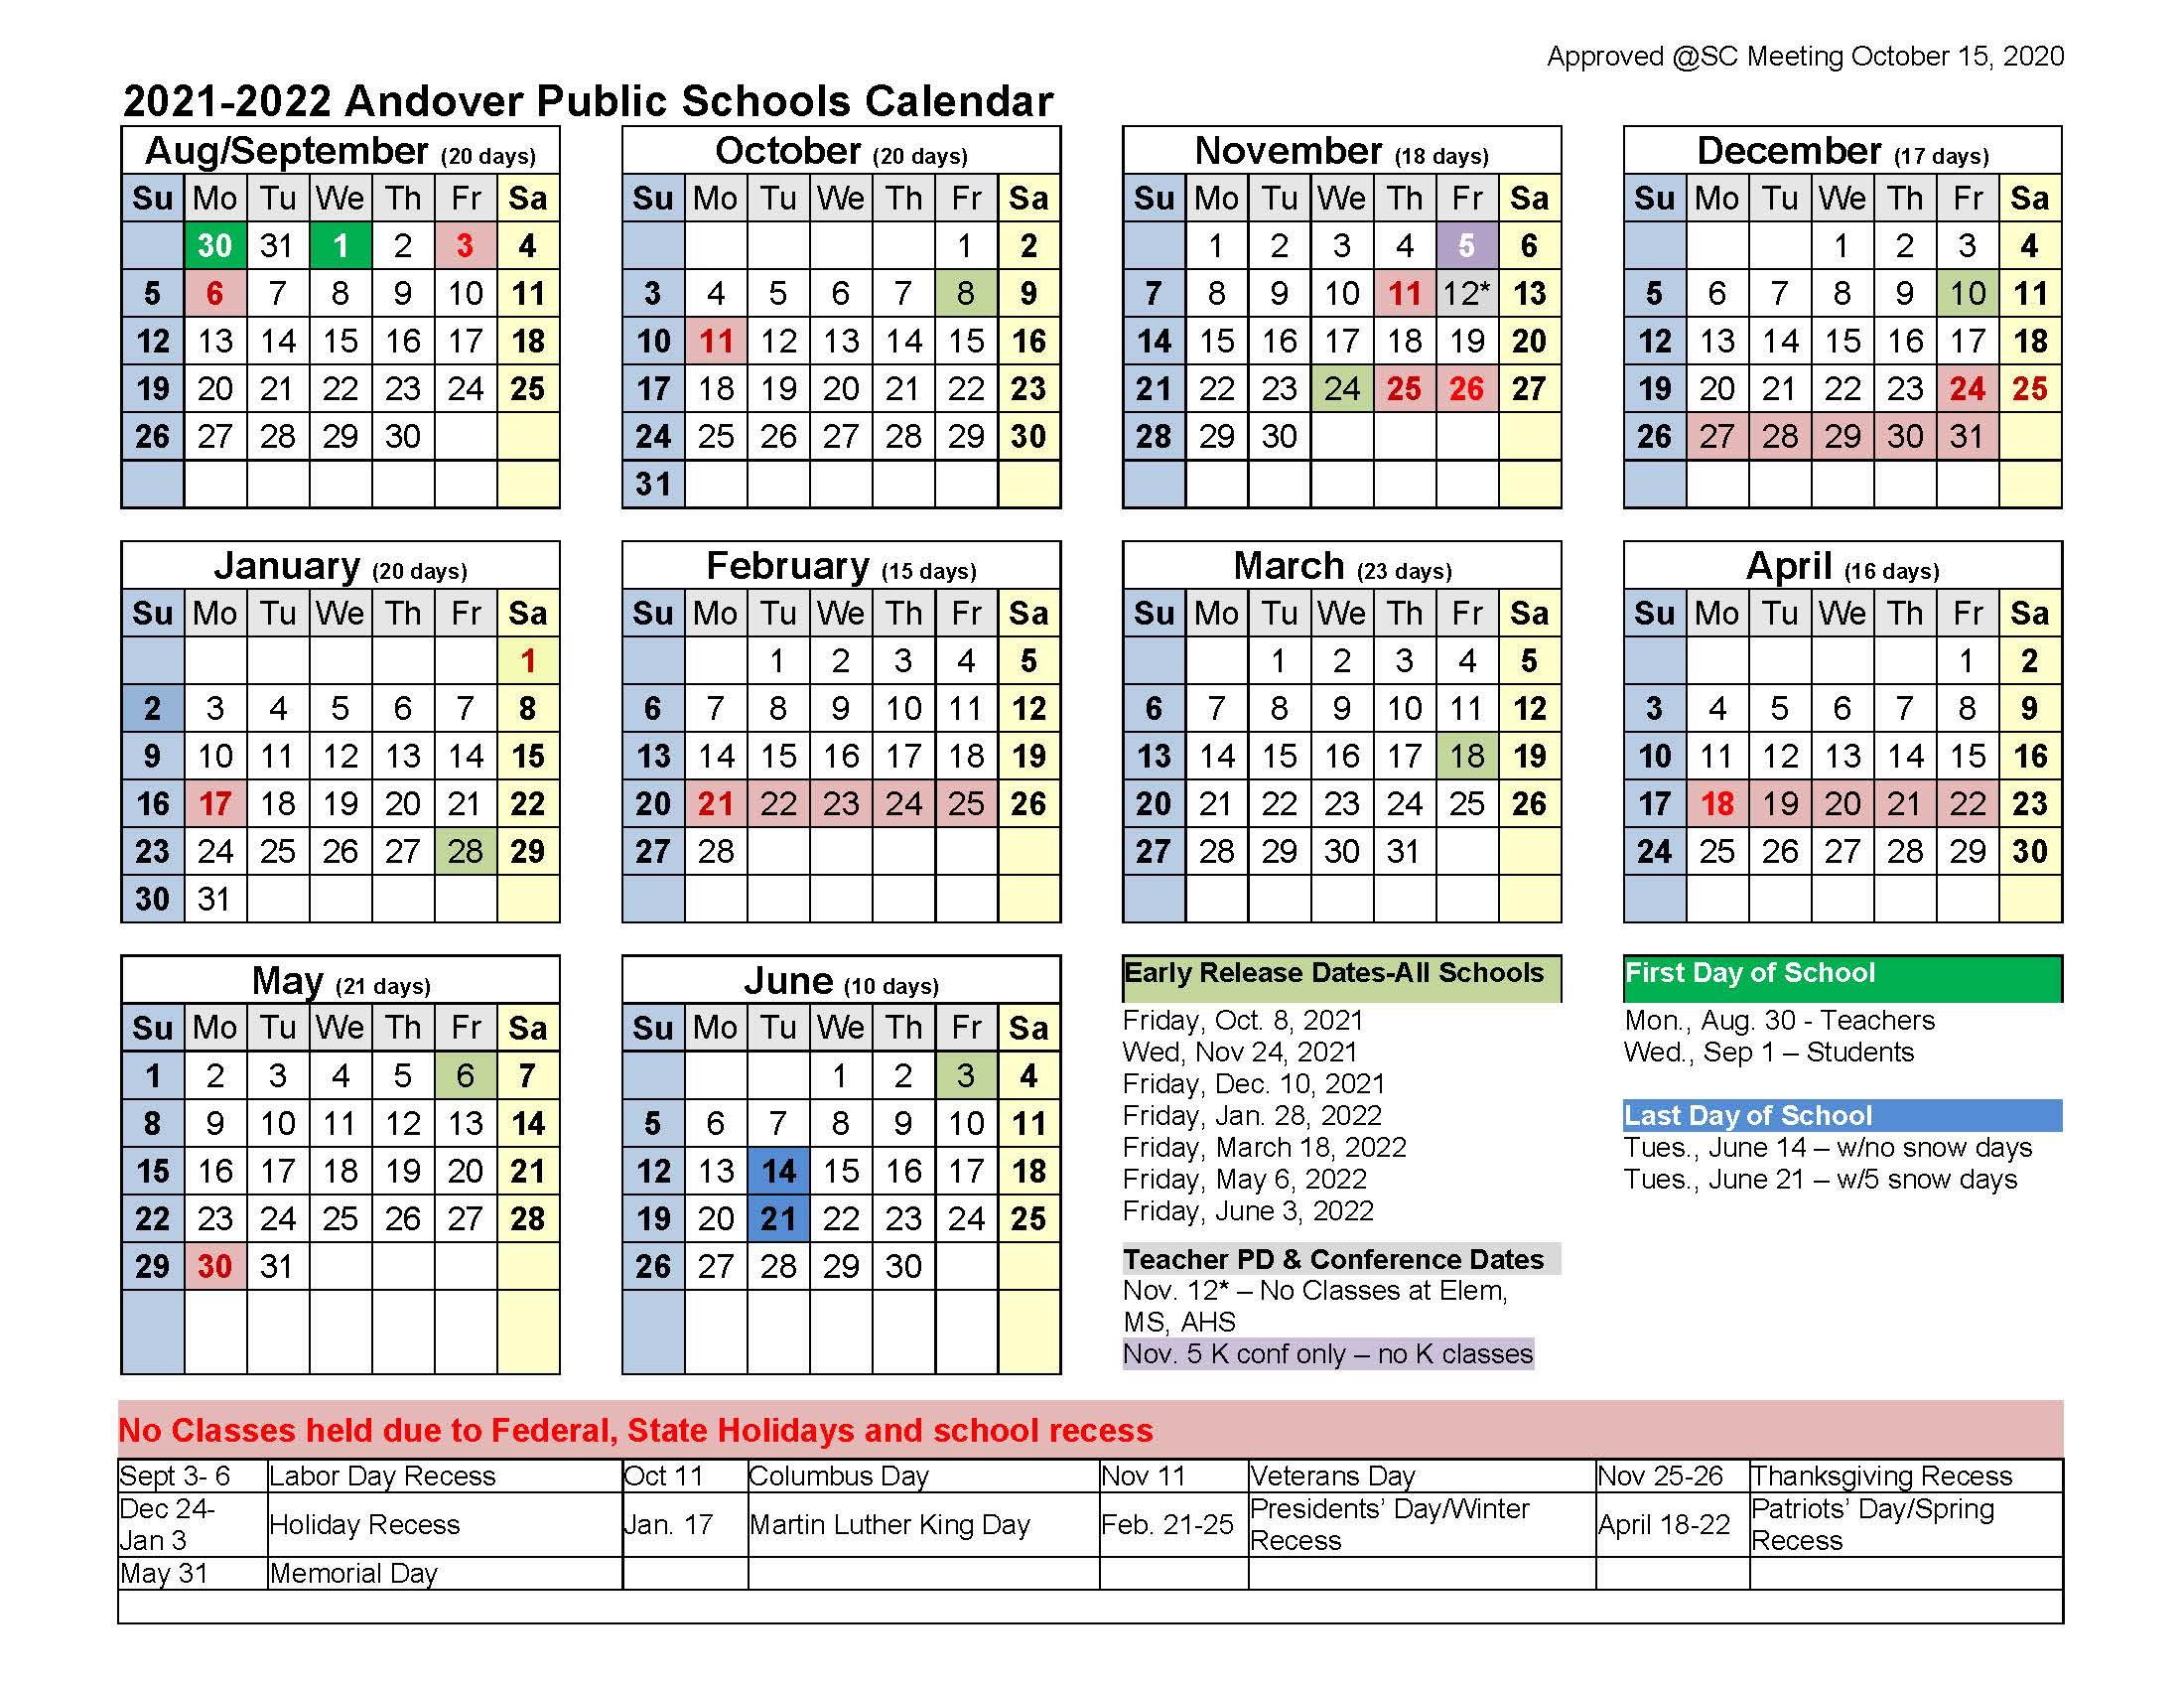 Mississippi State Academic Calendar 2022.School Year Calendar 2021 22 Andover Public Schools Official Website